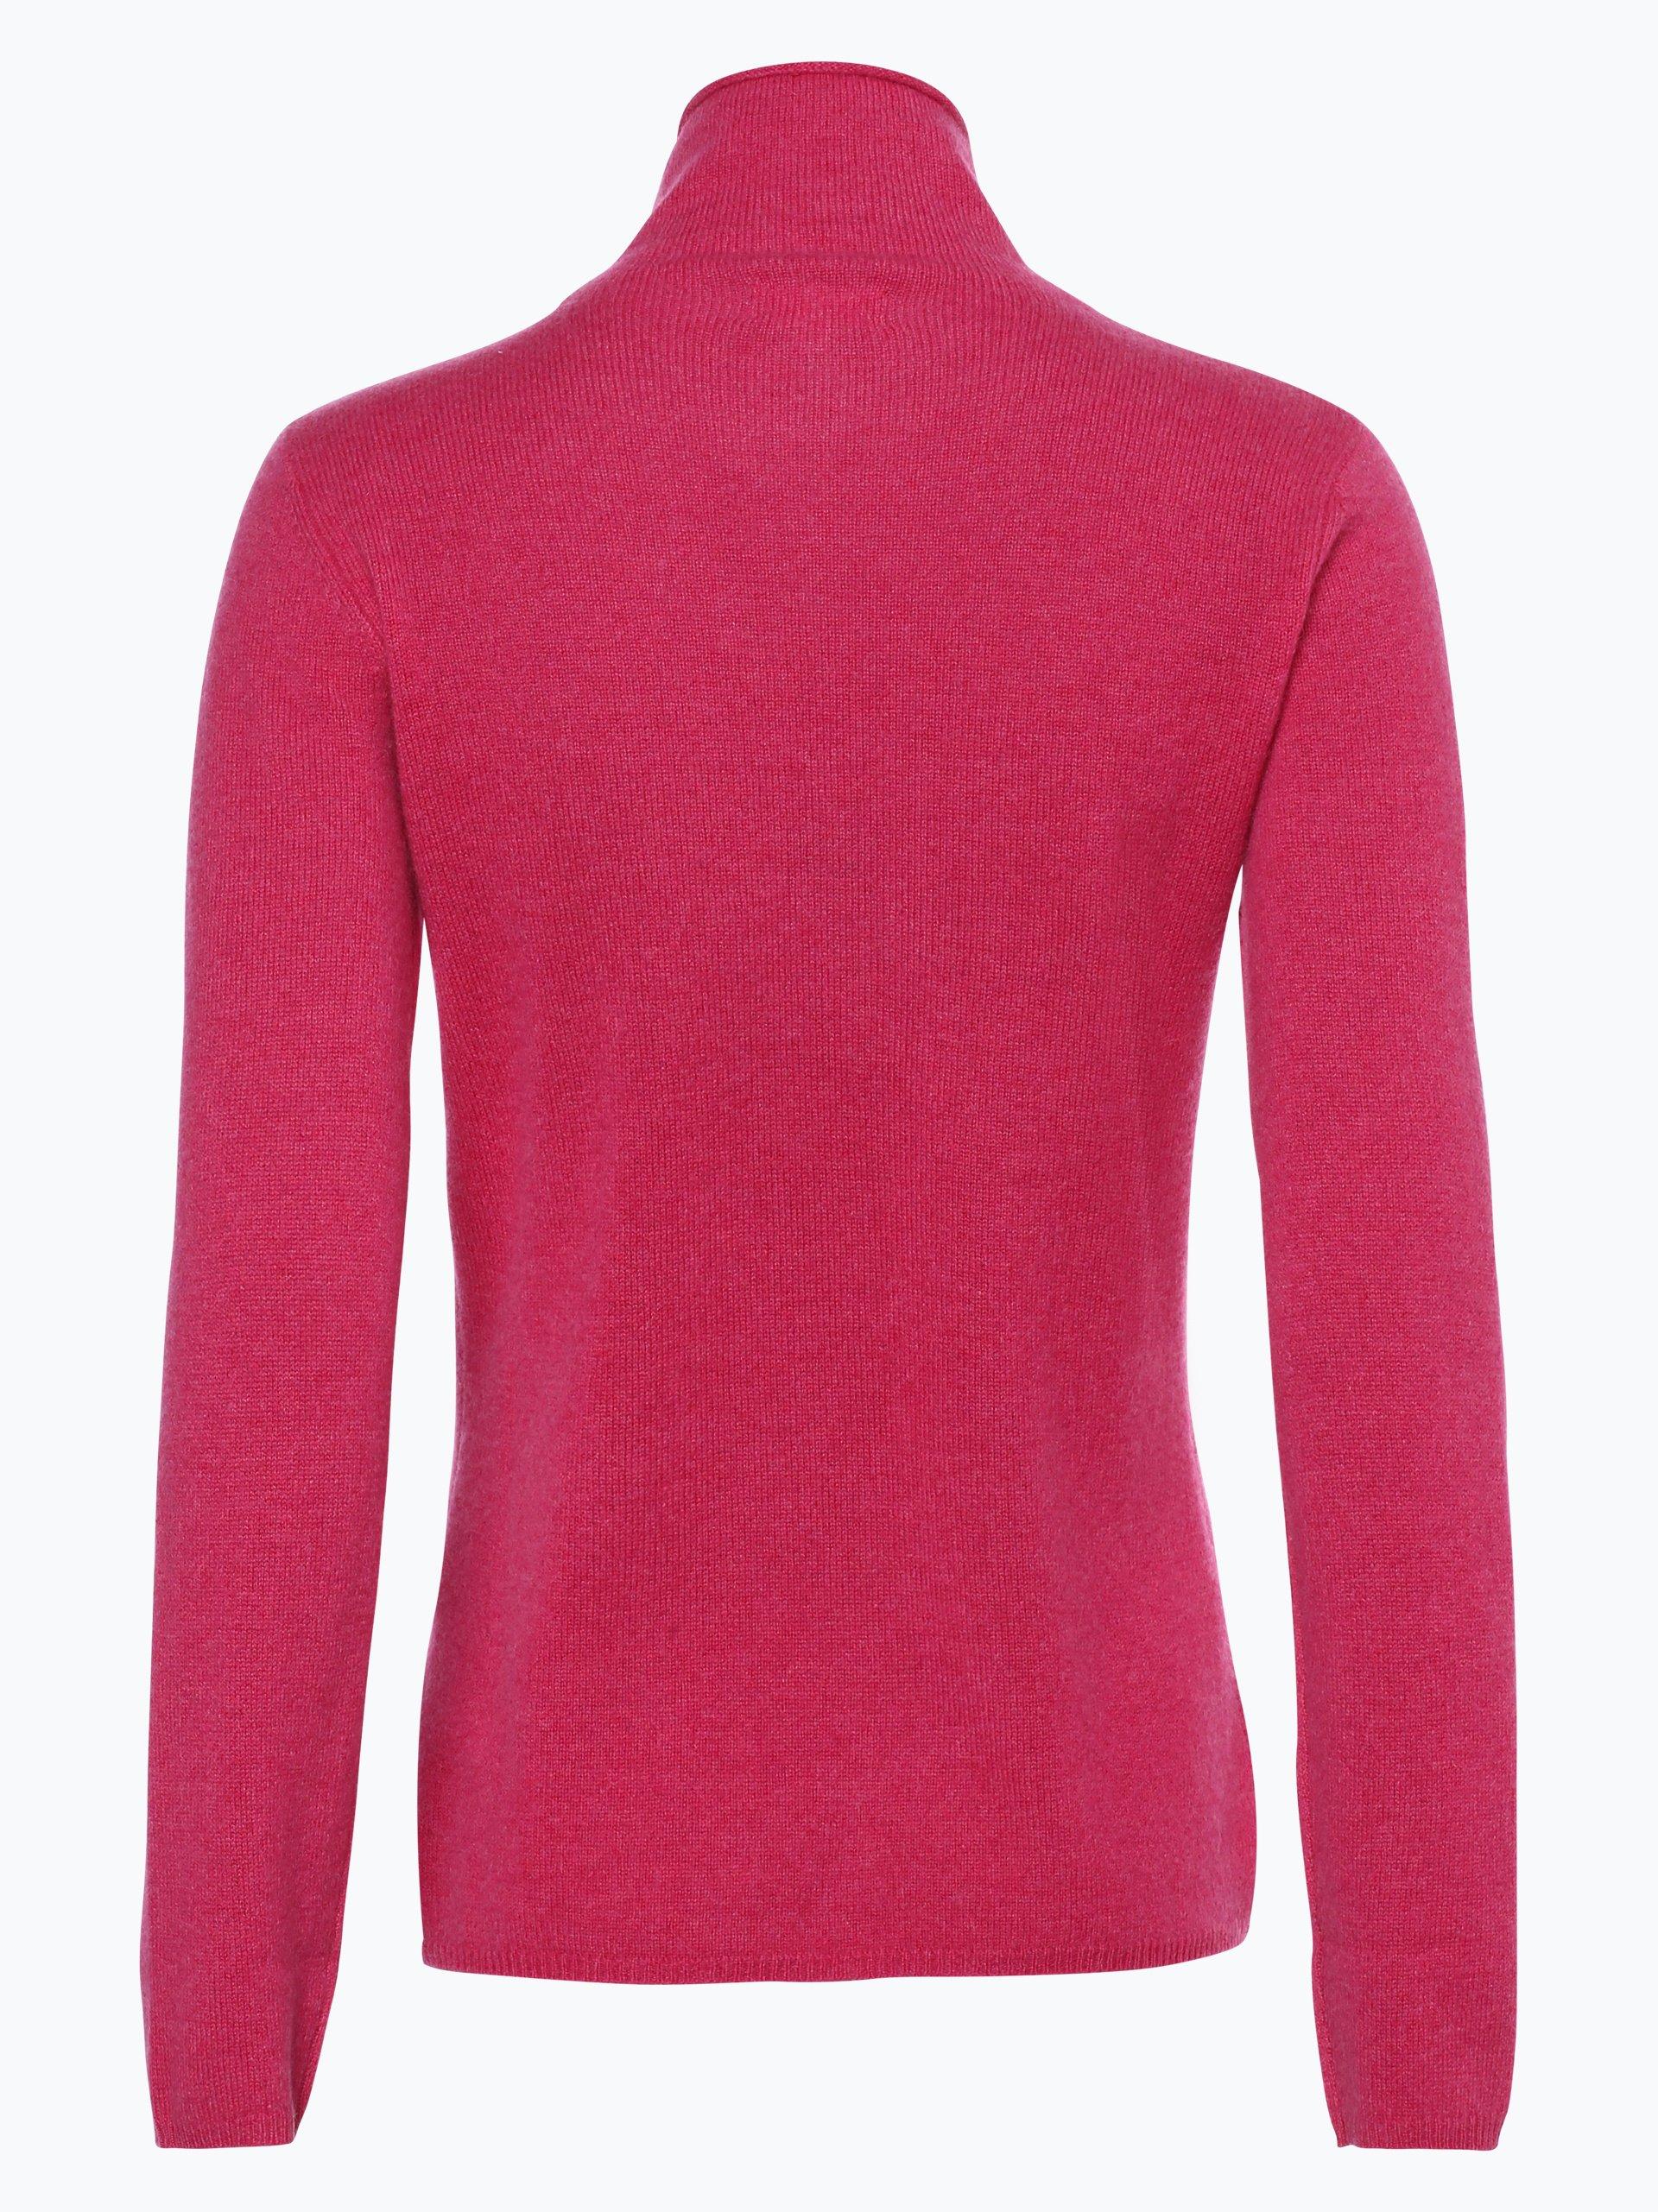 marie lund damen pure cashmere pullover pink uni online. Black Bedroom Furniture Sets. Home Design Ideas